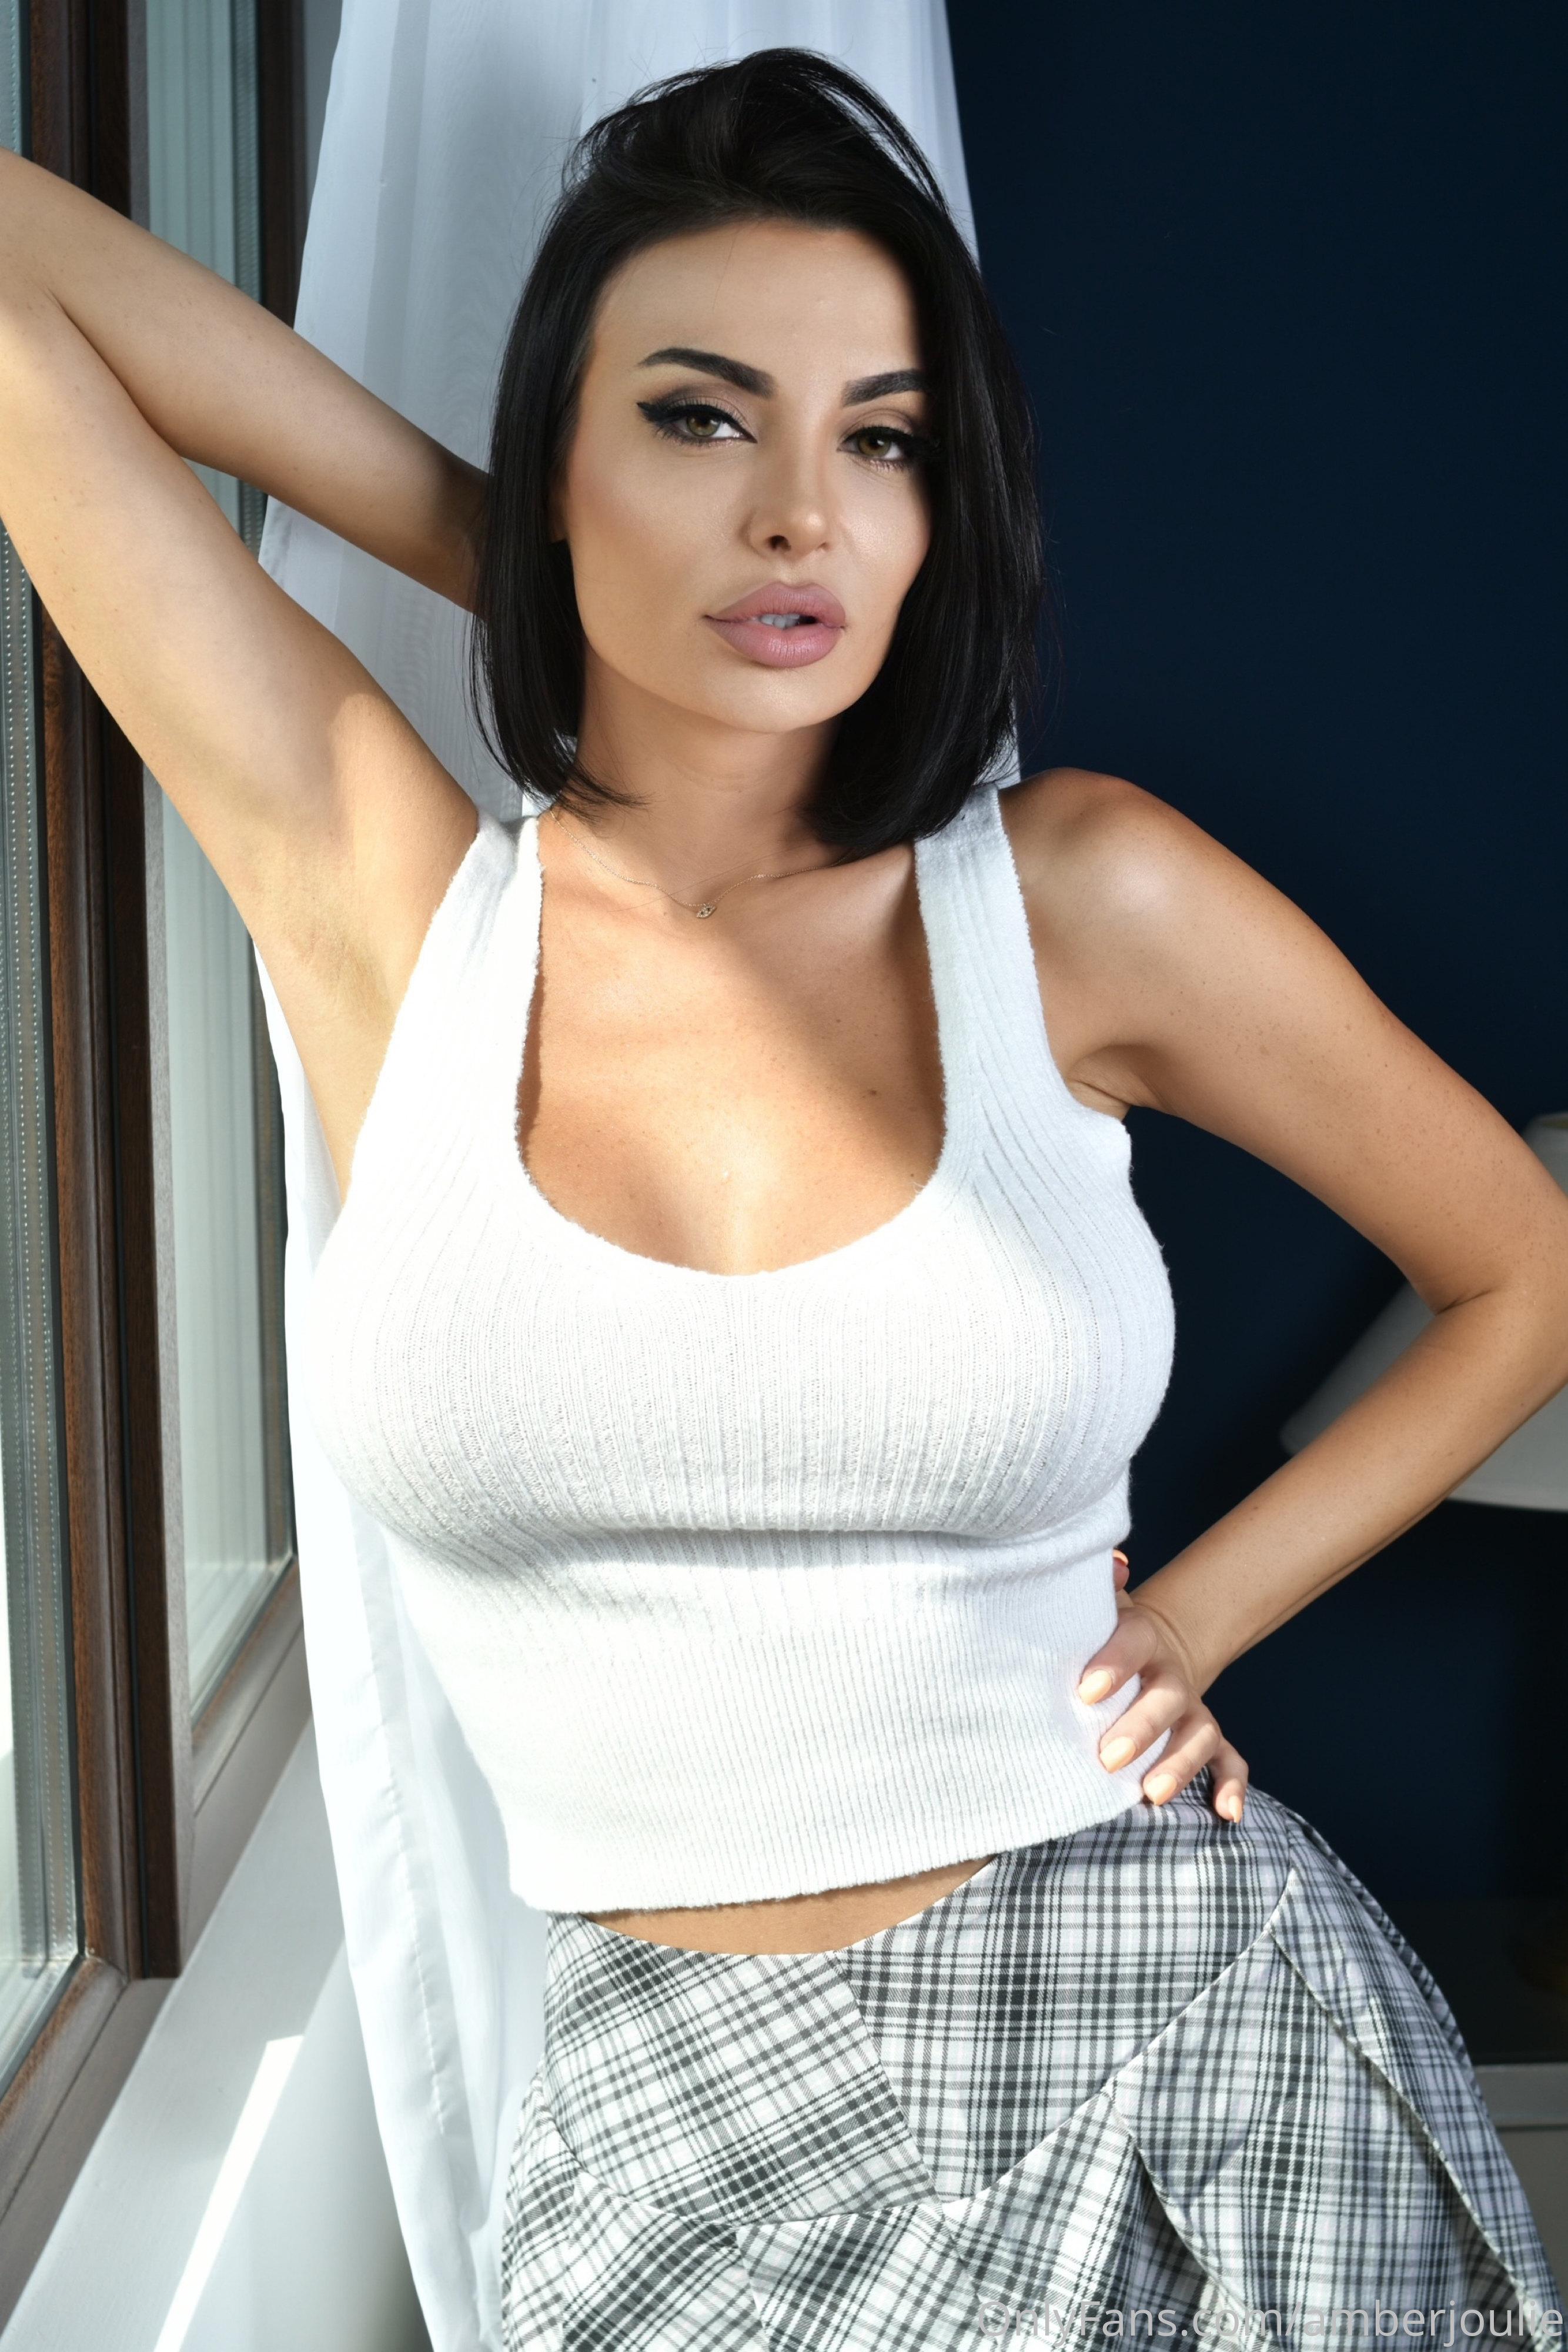 @amberjoulie nude photo 10